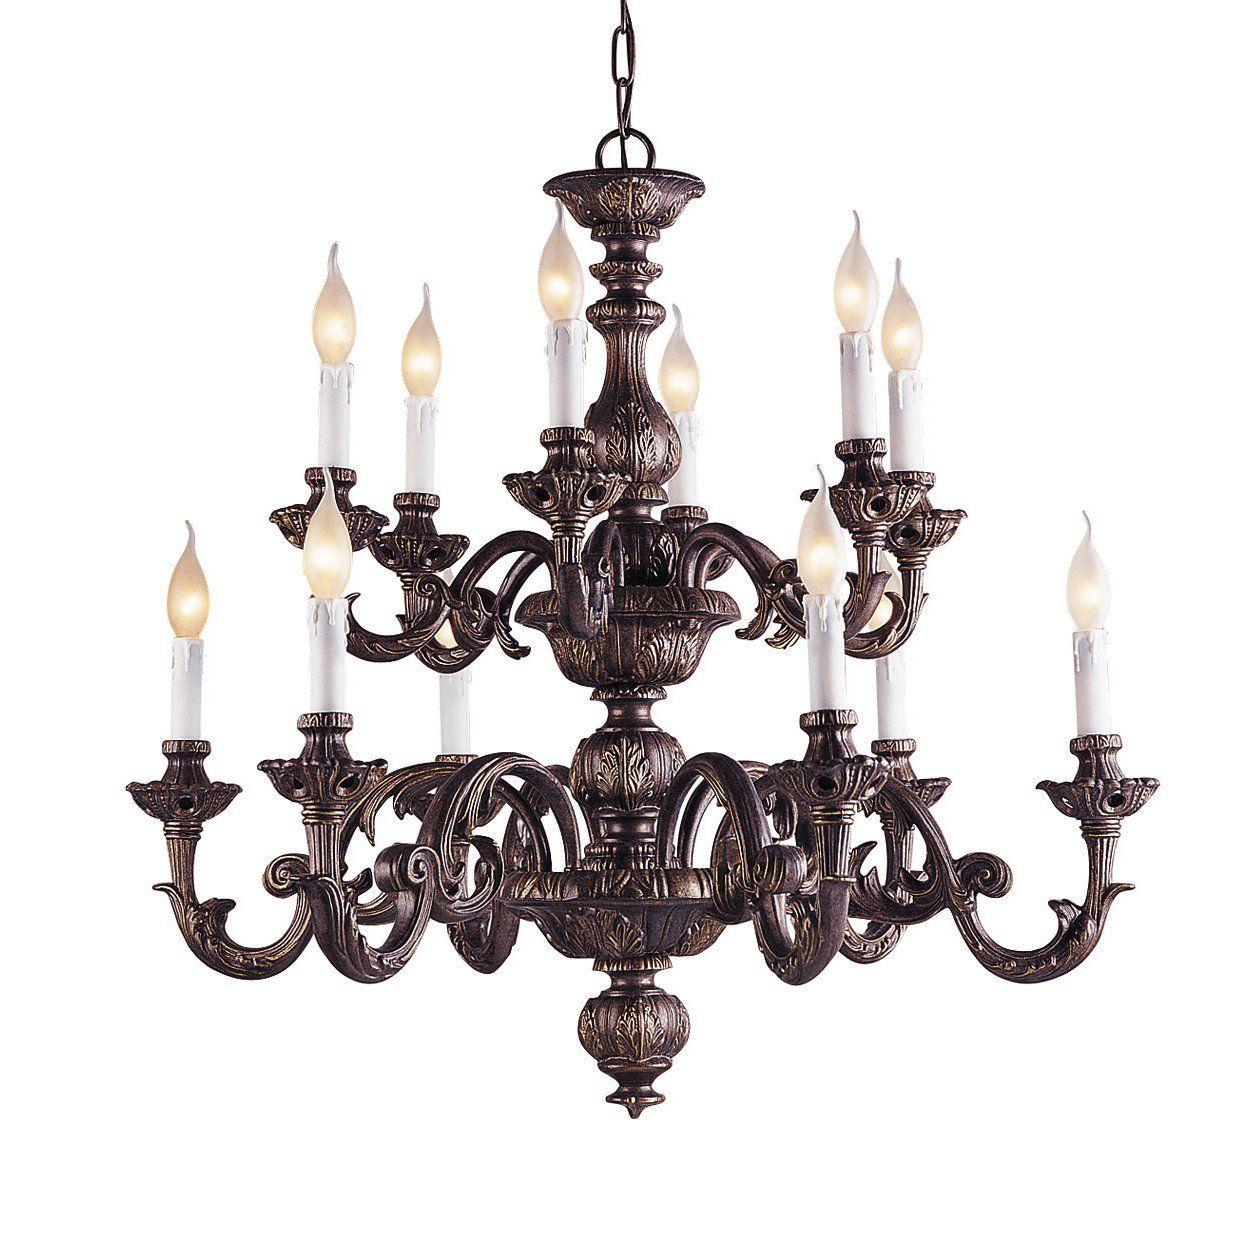 Weinstock lighting 3100 84ag 12 light filigree chandelier autumn weinstock lighting 3100 84ag 12 light filigree chandelier autumn gold arubaitofo Image collections